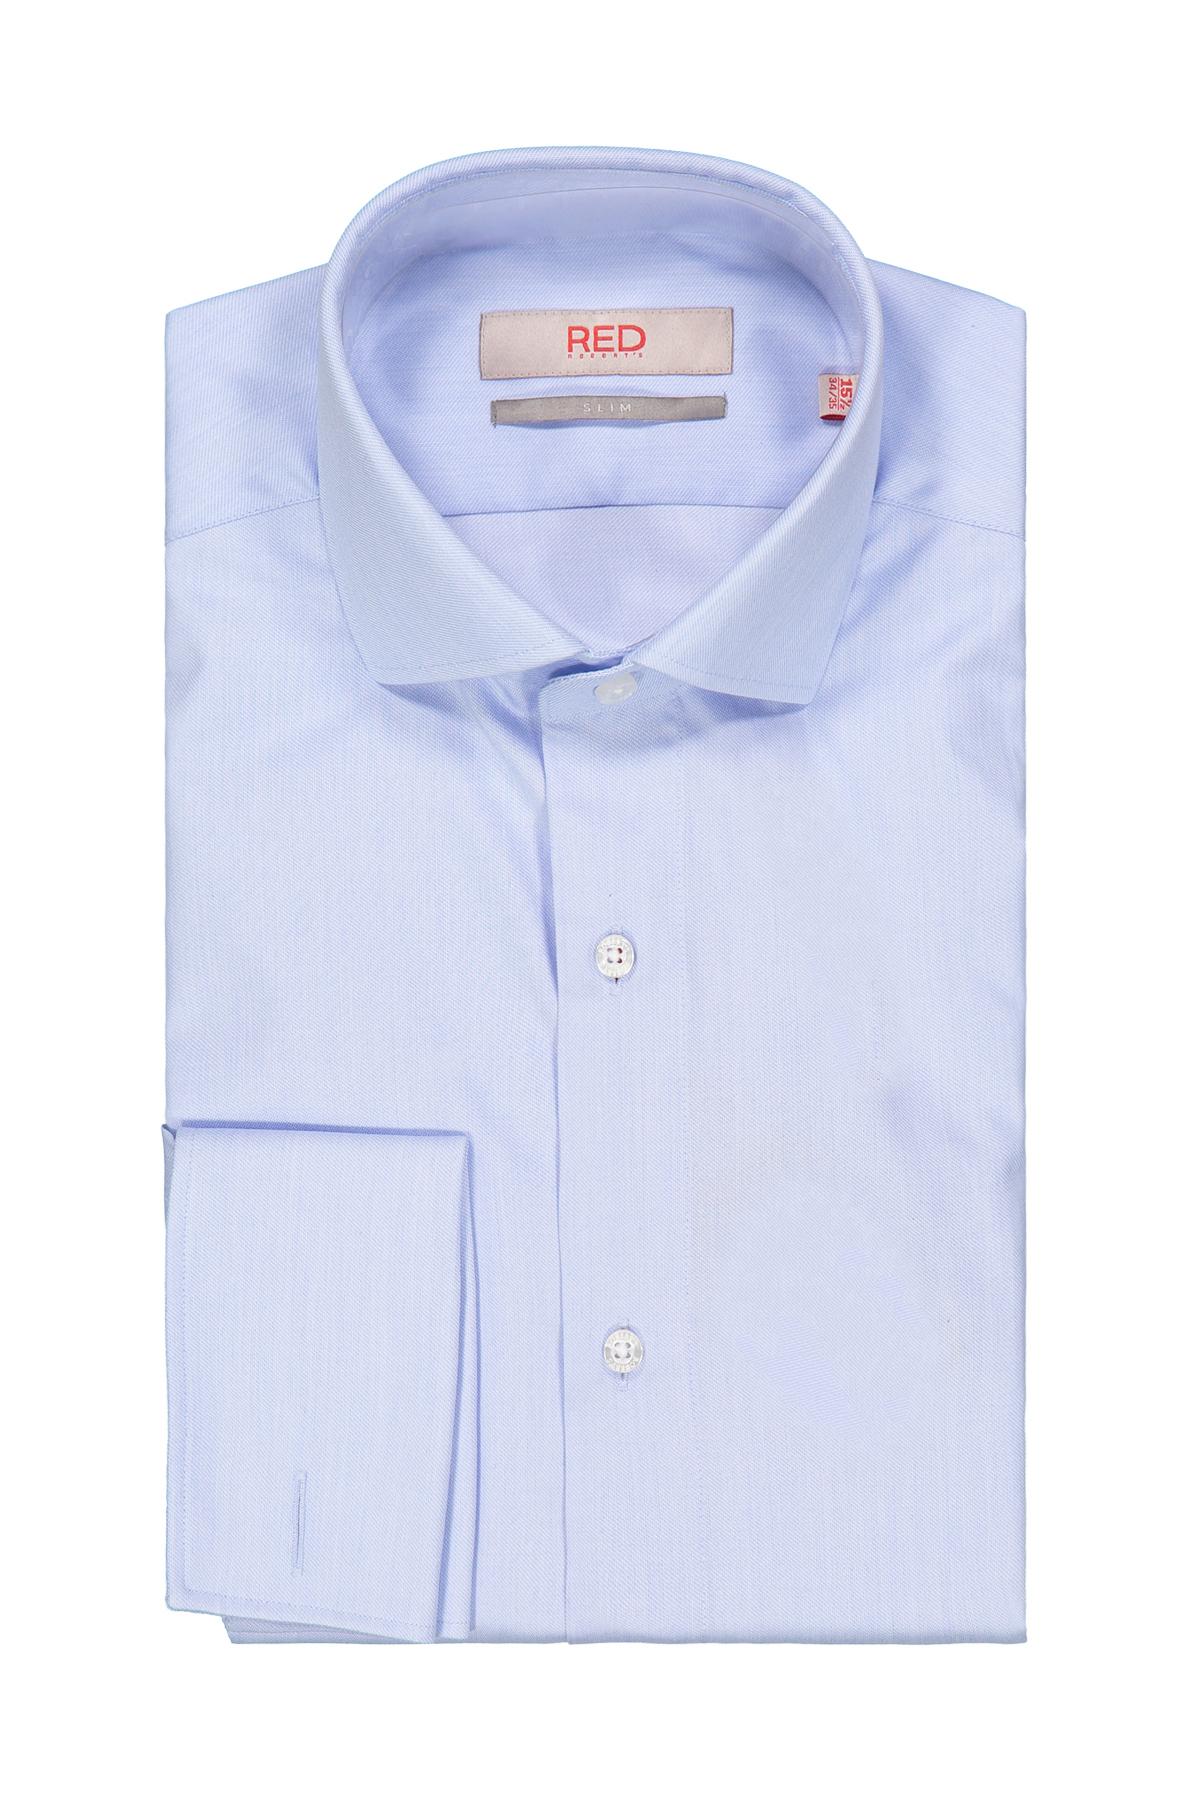 Camisa Vestir ROBERTS RED Azul